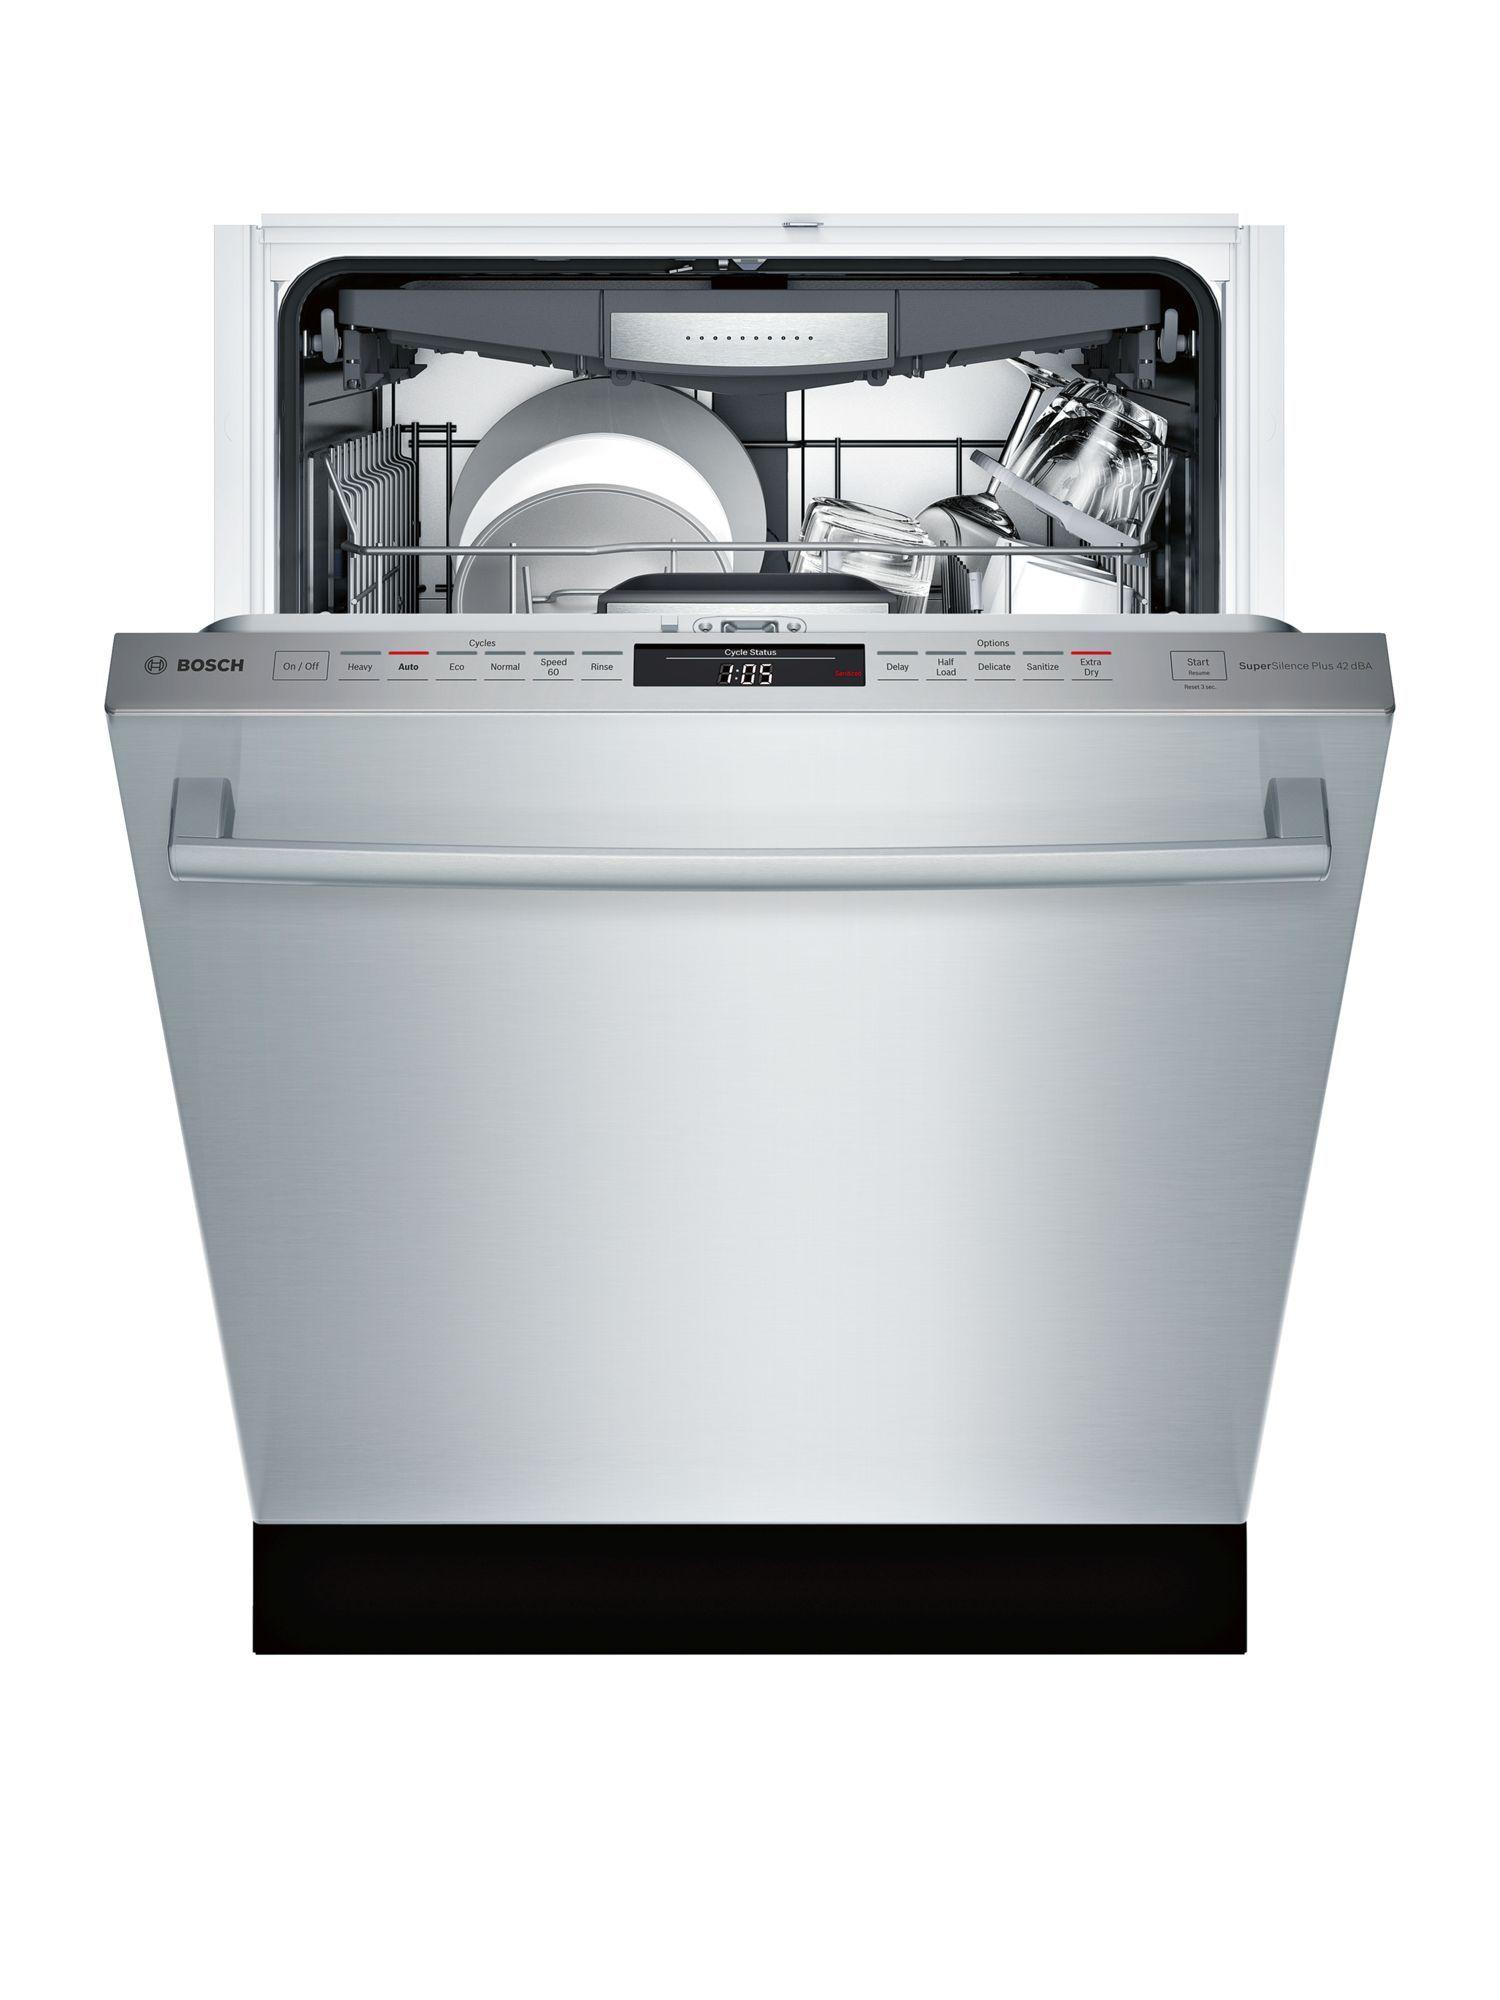 Bosch Shxm78w55n Dishwasher Bosch Dishwashers Best Dishwasher Dishwasher